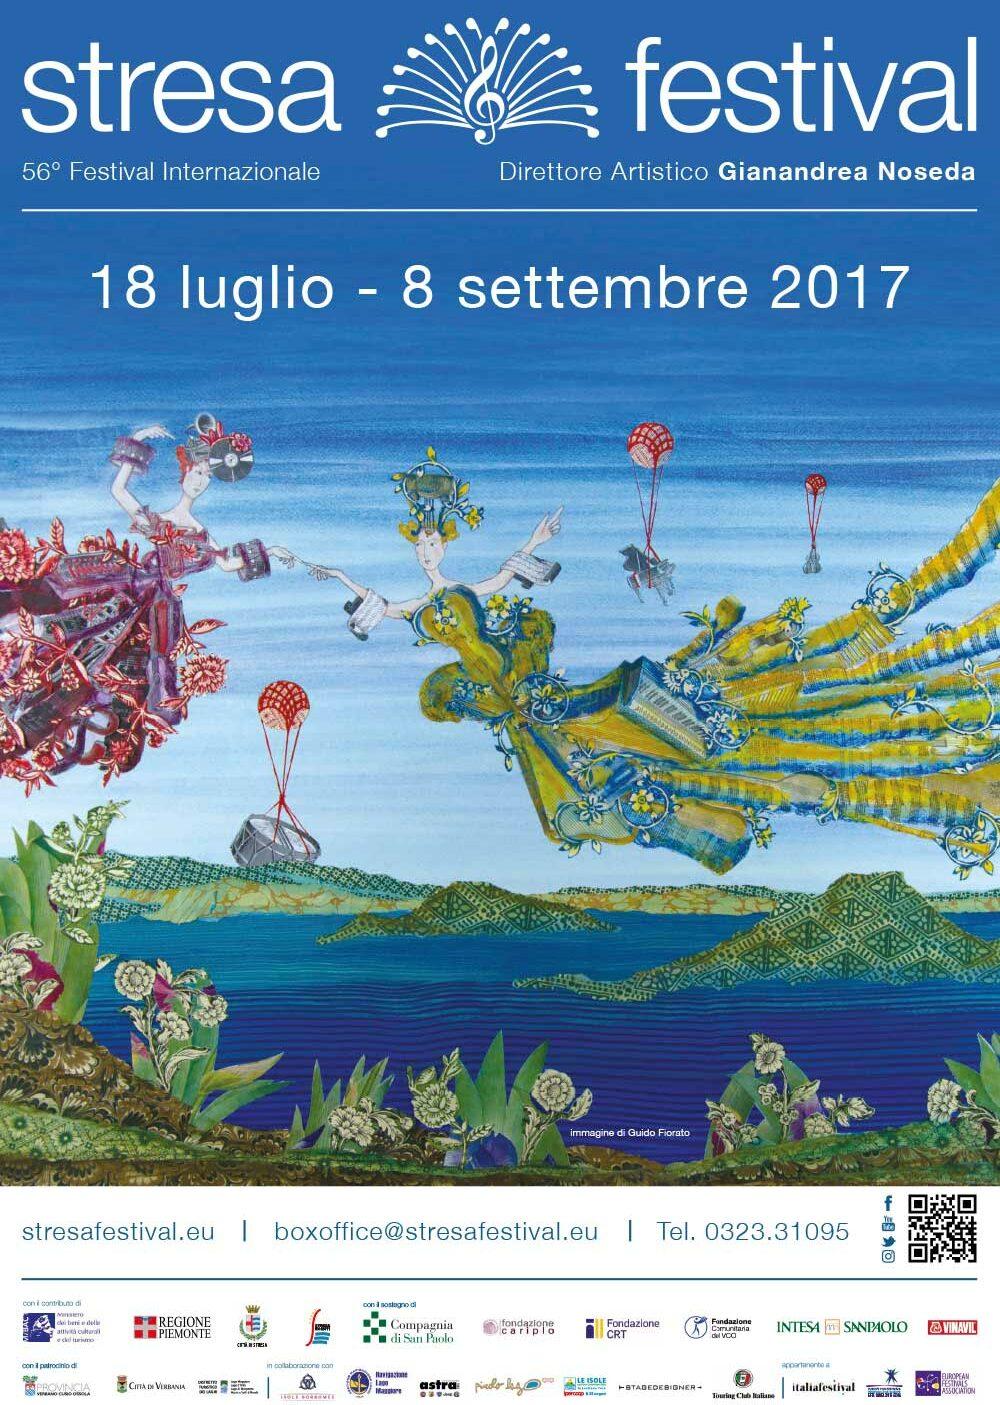 Stresa-Festival-locandina-2017